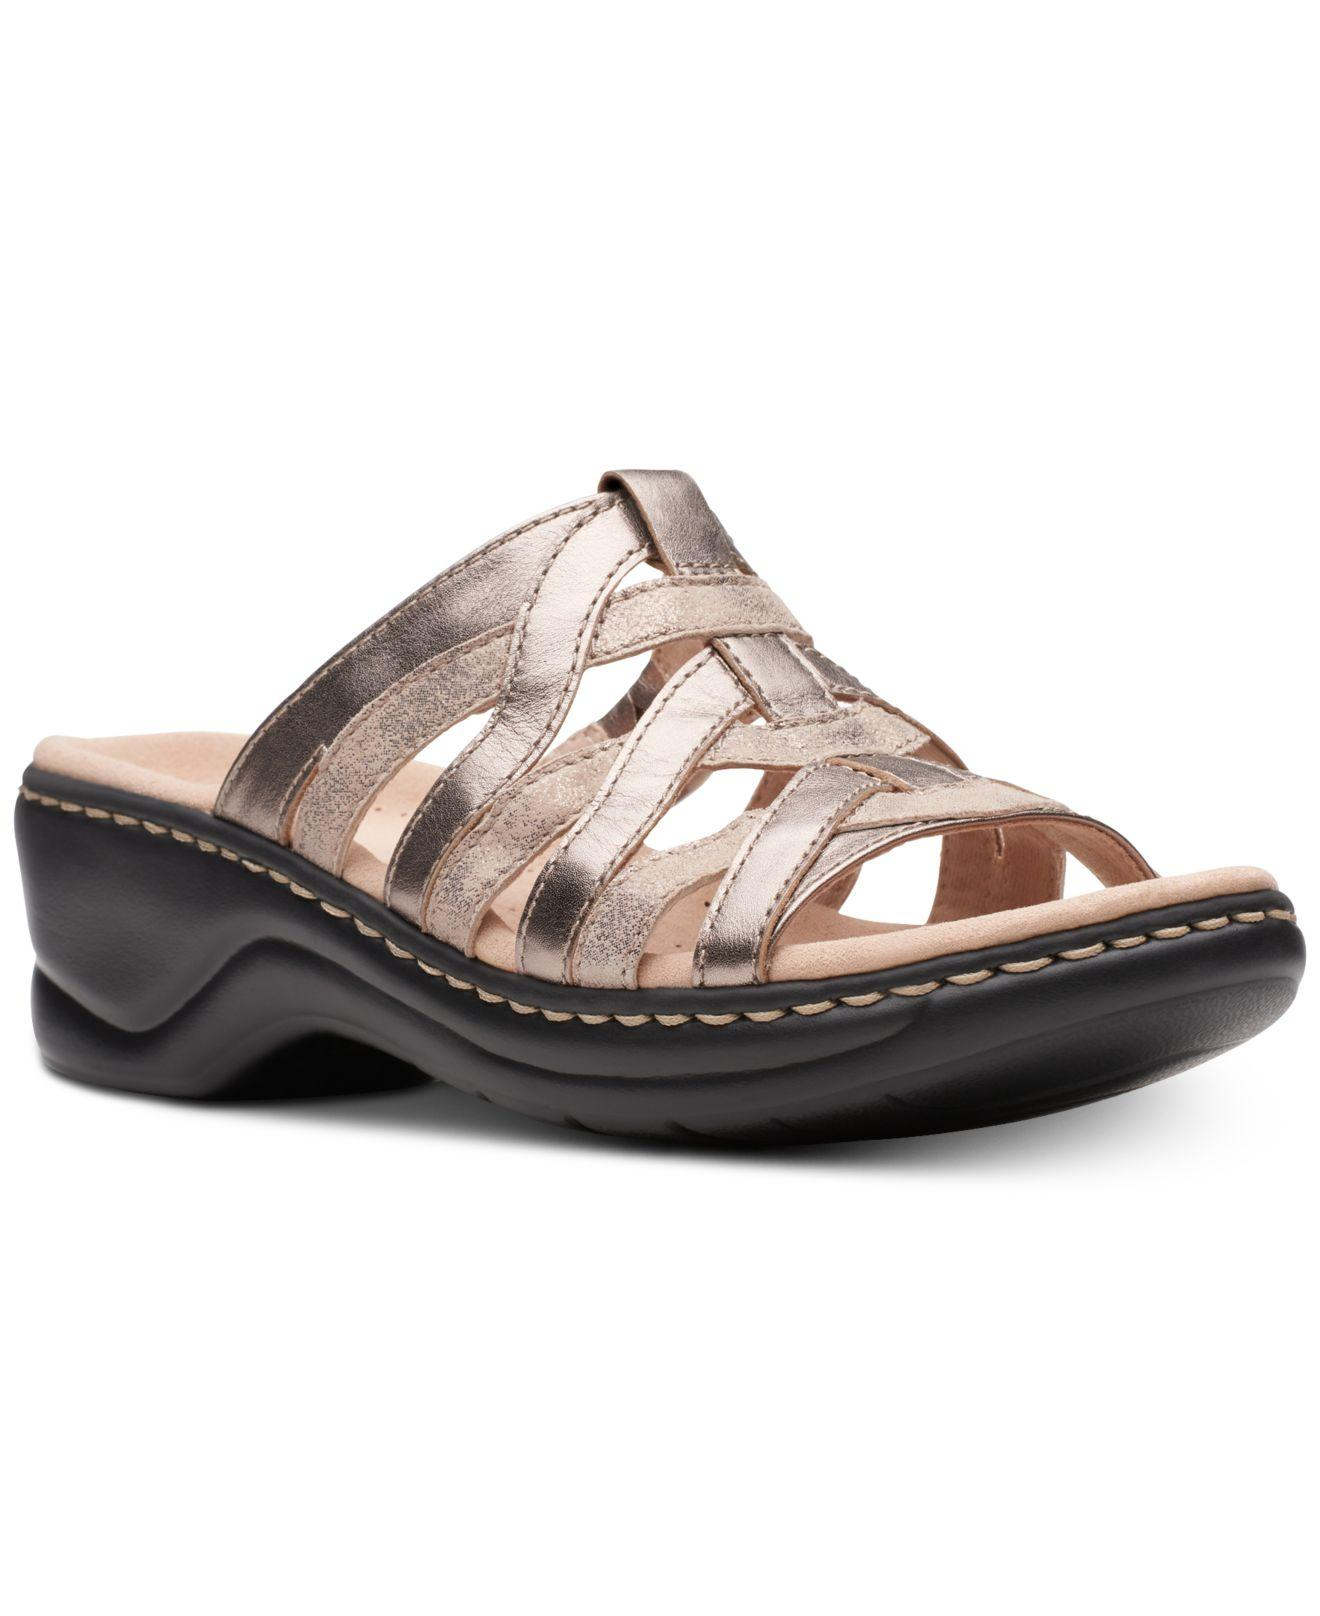 852f68bb91a63f Clarks. Women s Metallic Lexi Mina Sandals ...